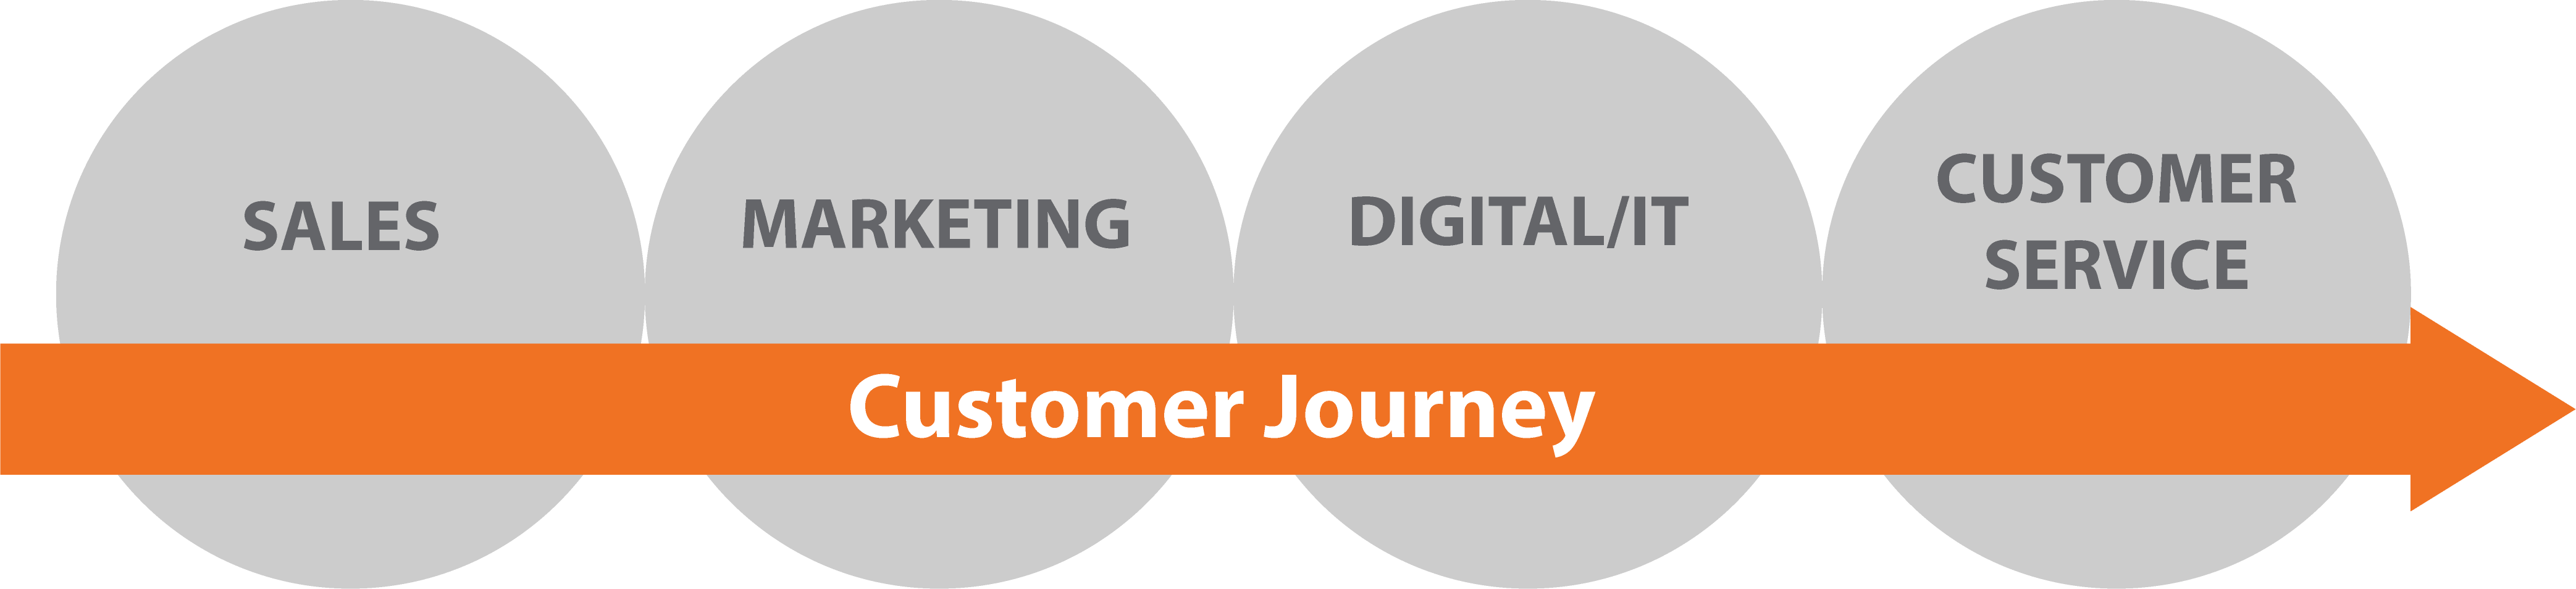 Graphic explaining the mobile customer journey